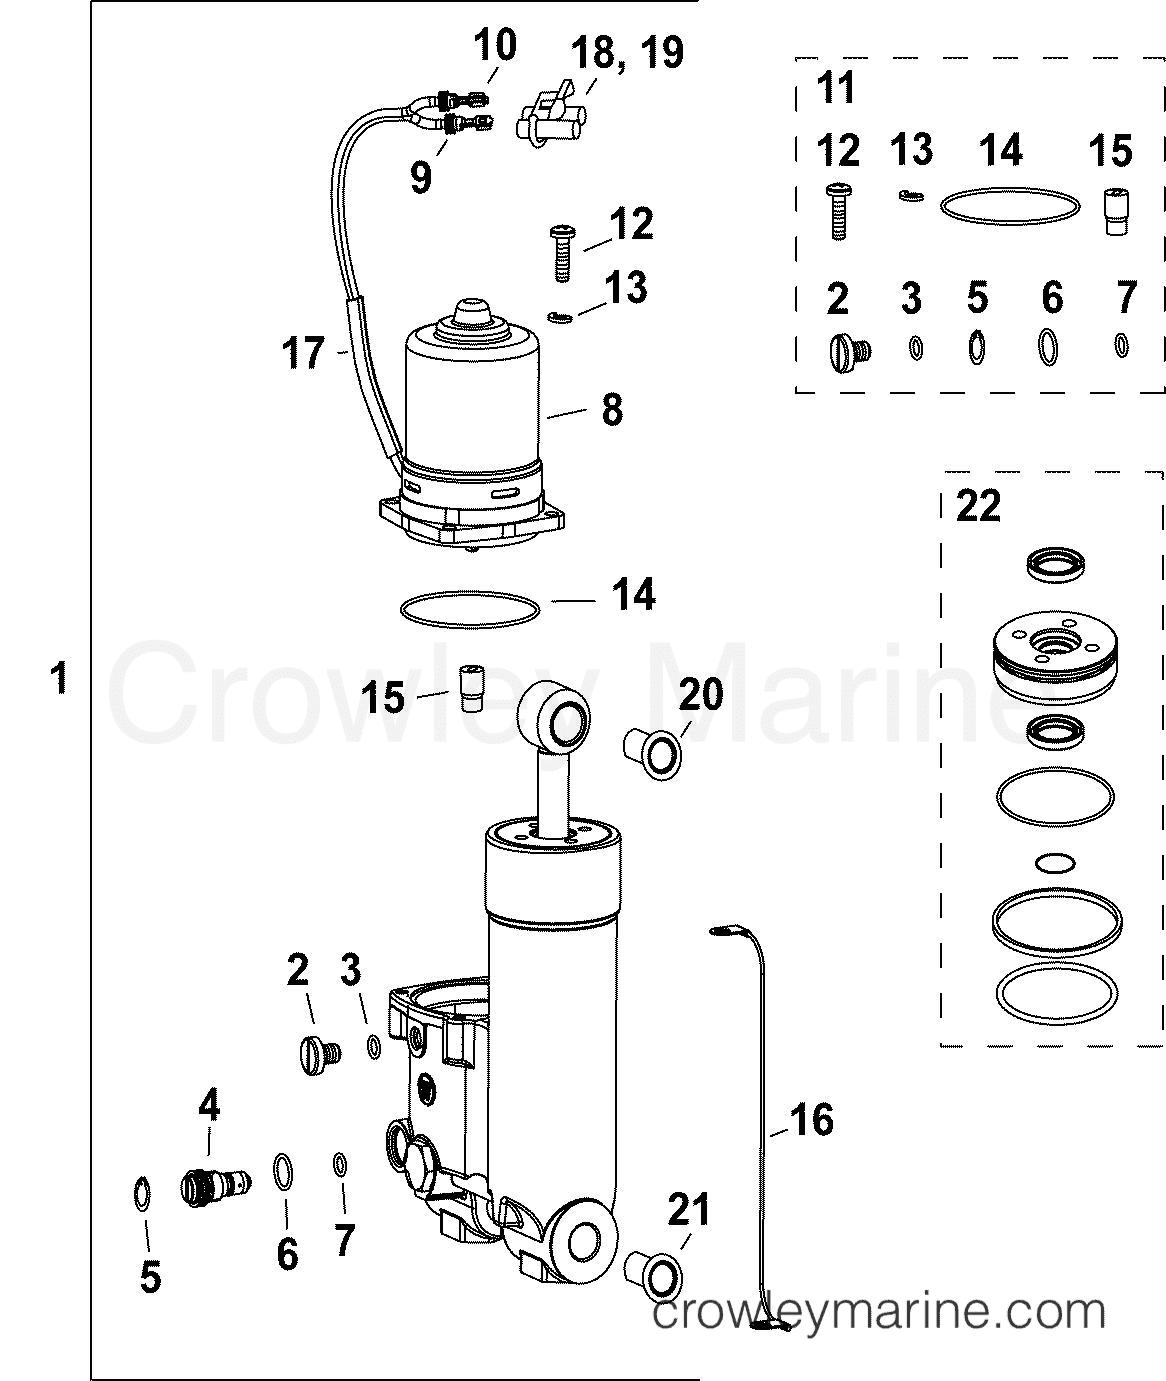 Trim Amp Tilt Hydraulic Assembly